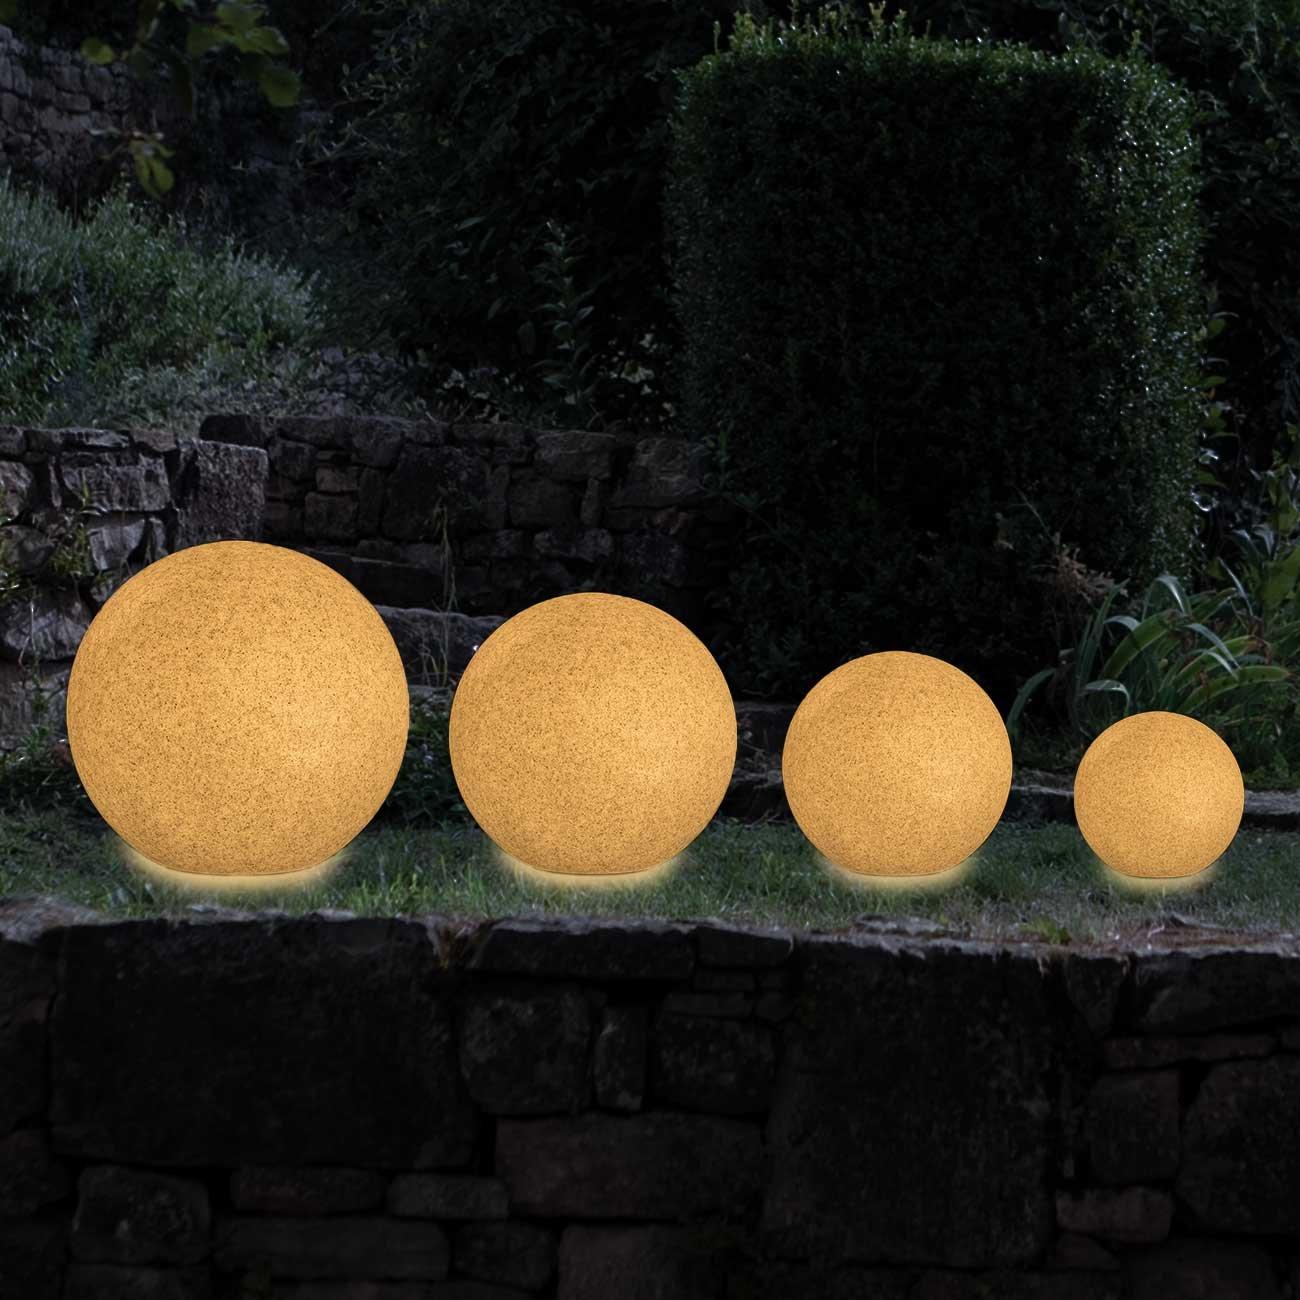 /Ø 20 cm Gris MAXCRAFT Lampe de Jardin Ronde Culot E27 Boule Lampe IP65 Ext/érieur